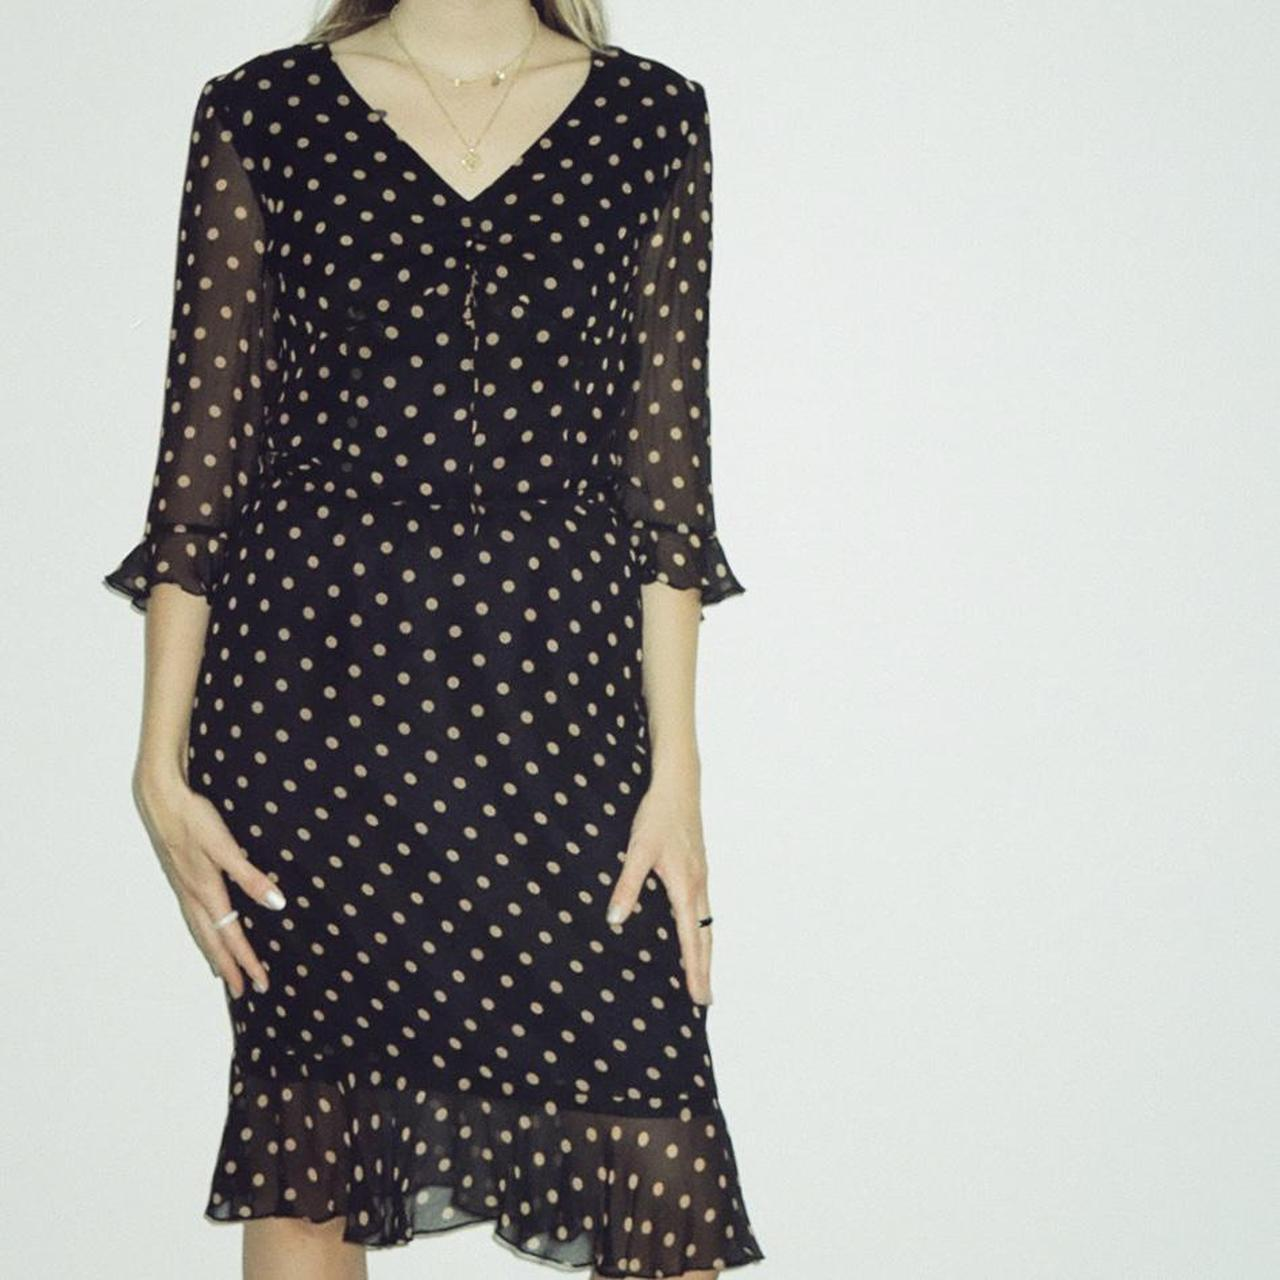 Product Image 1 - Silk Black And Tan Polka